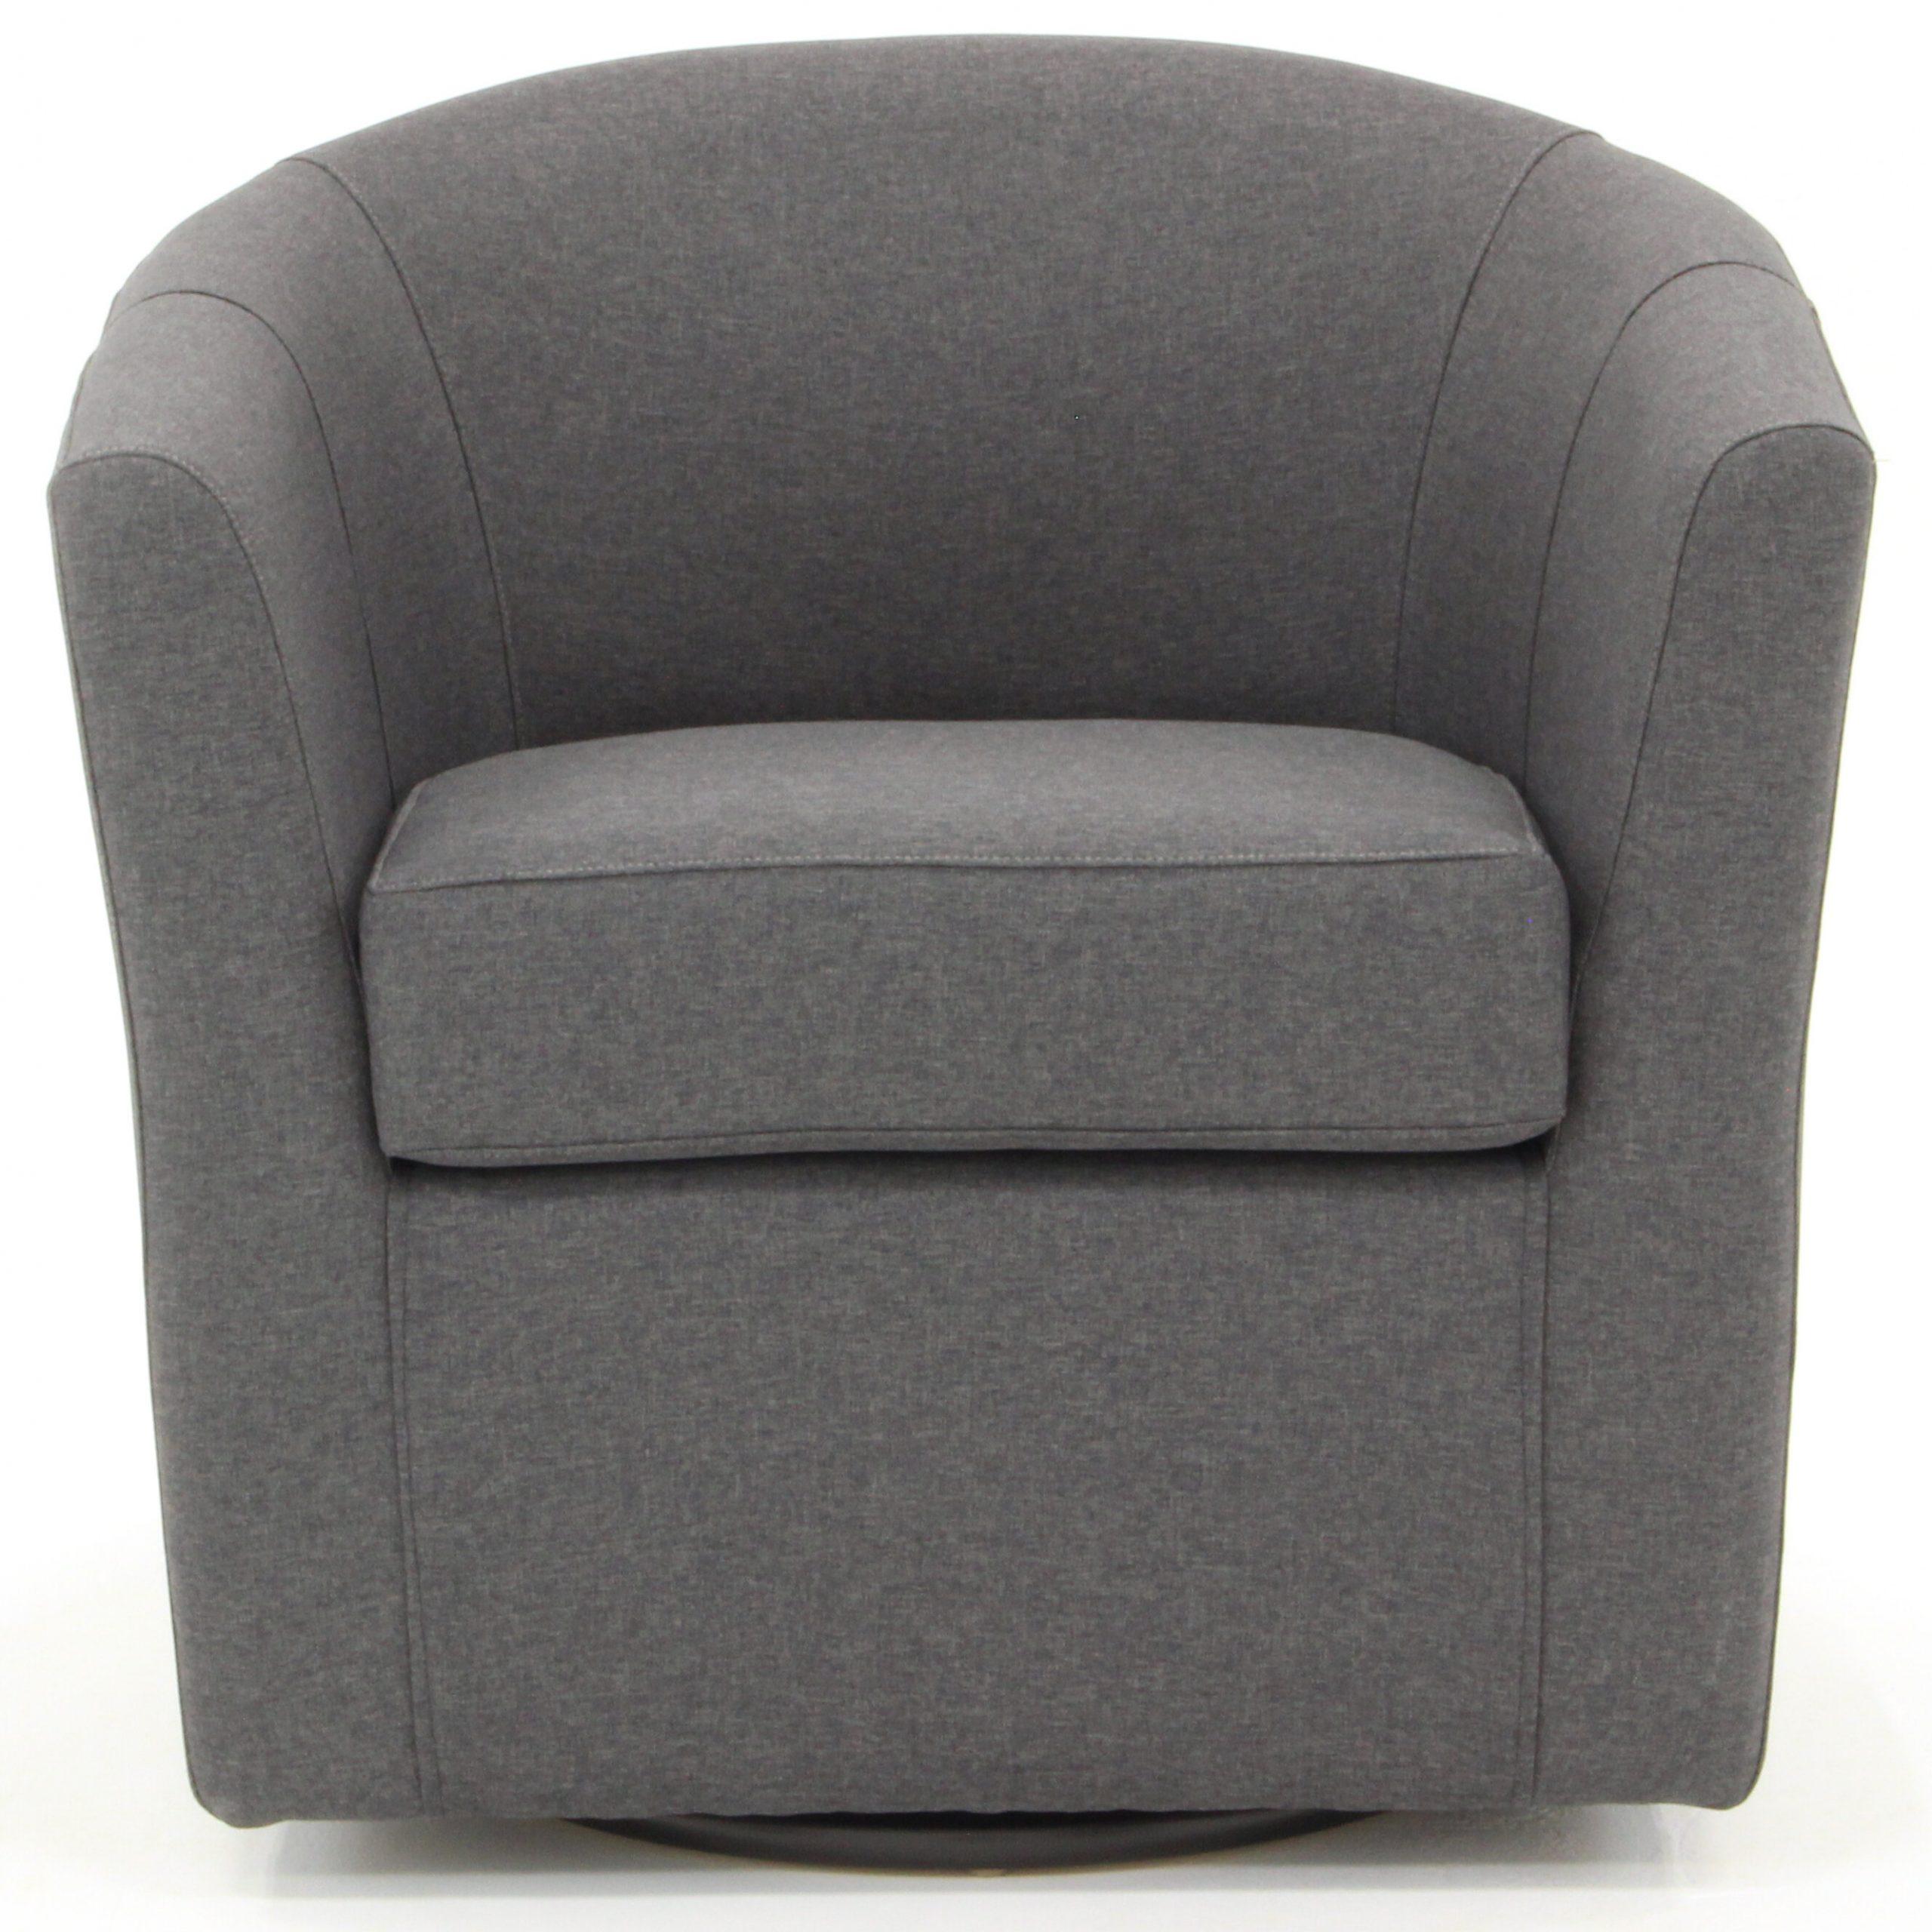 Featured Image of Molinari Swivel Barrel Chairs